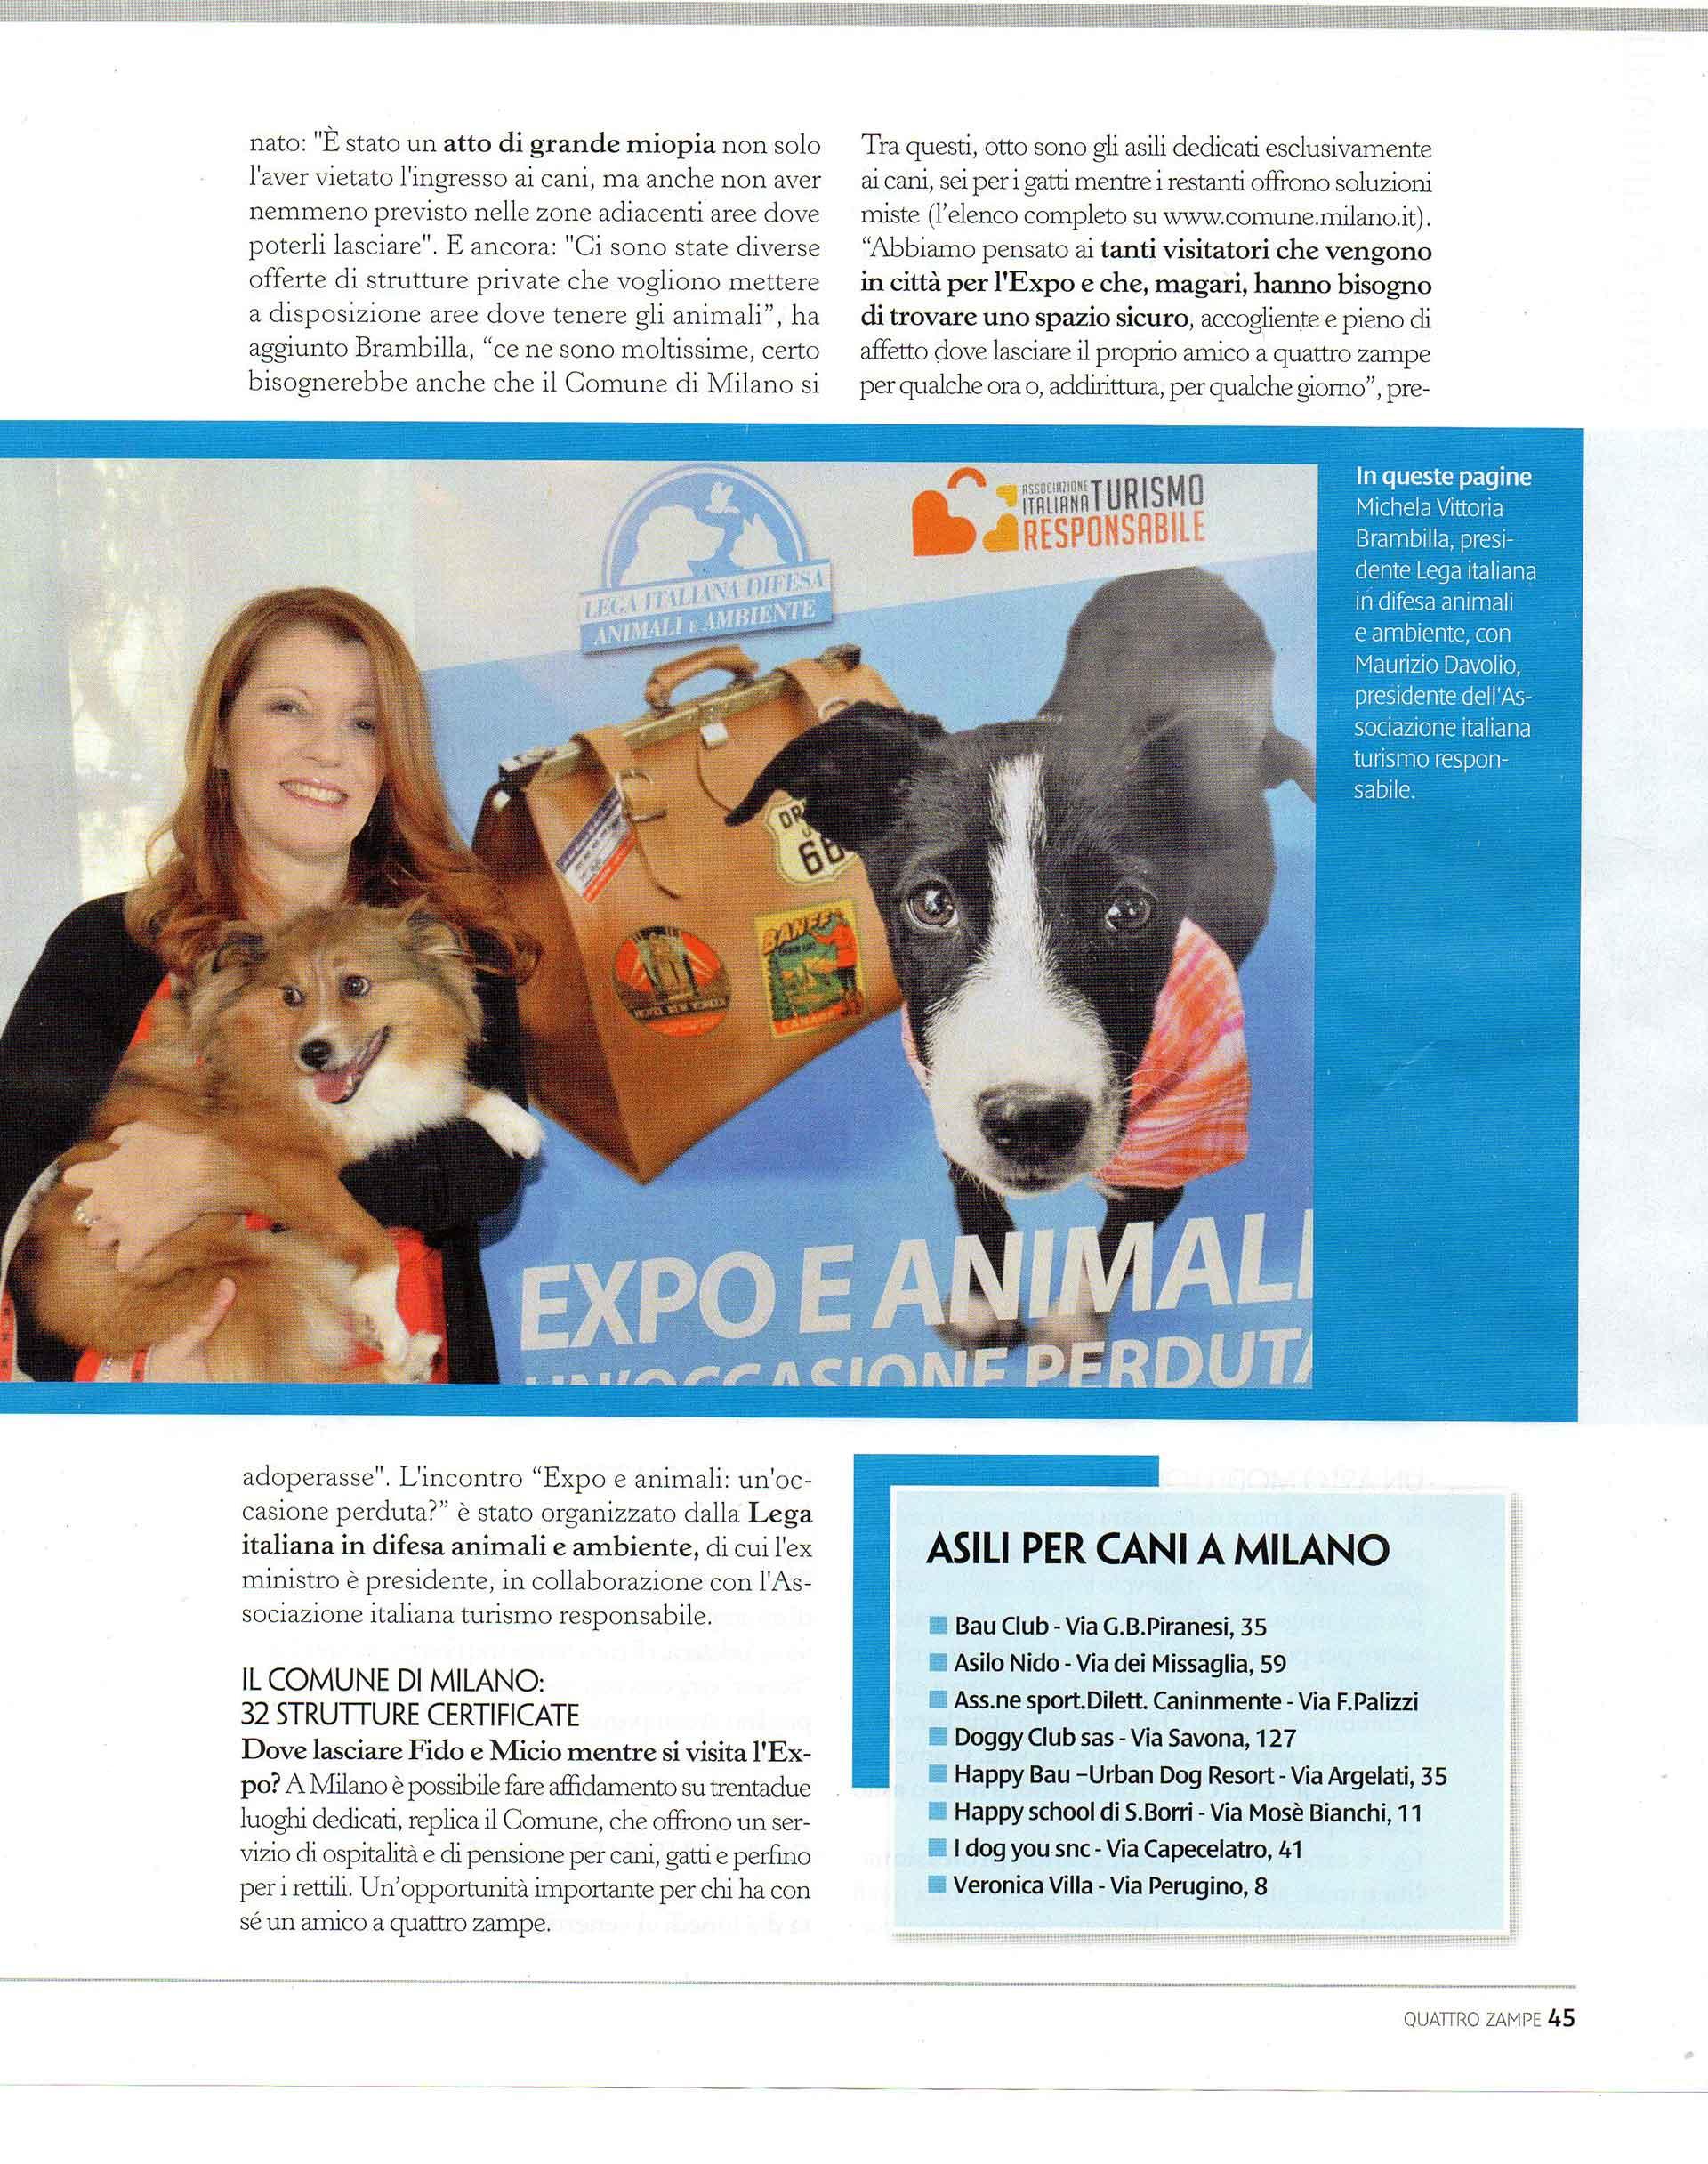 quattro-zampe-bauclub-asilo-educazione-cani-milano-03